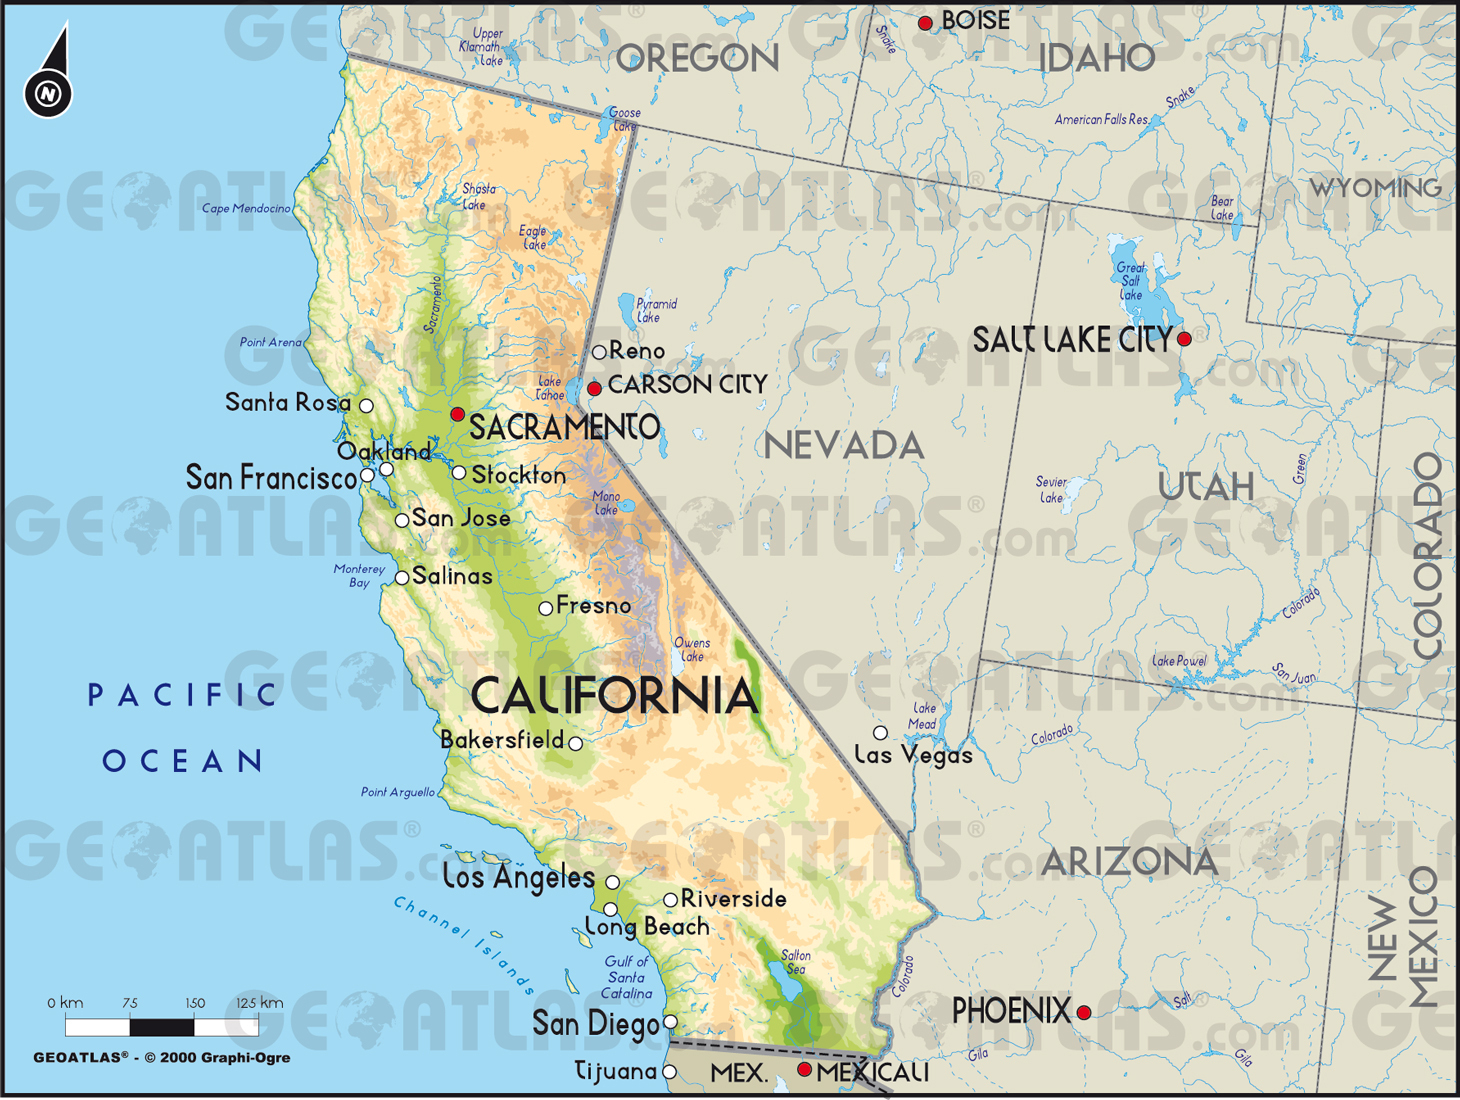 Google Maps California Cities Map California California Maps - Google Maps California